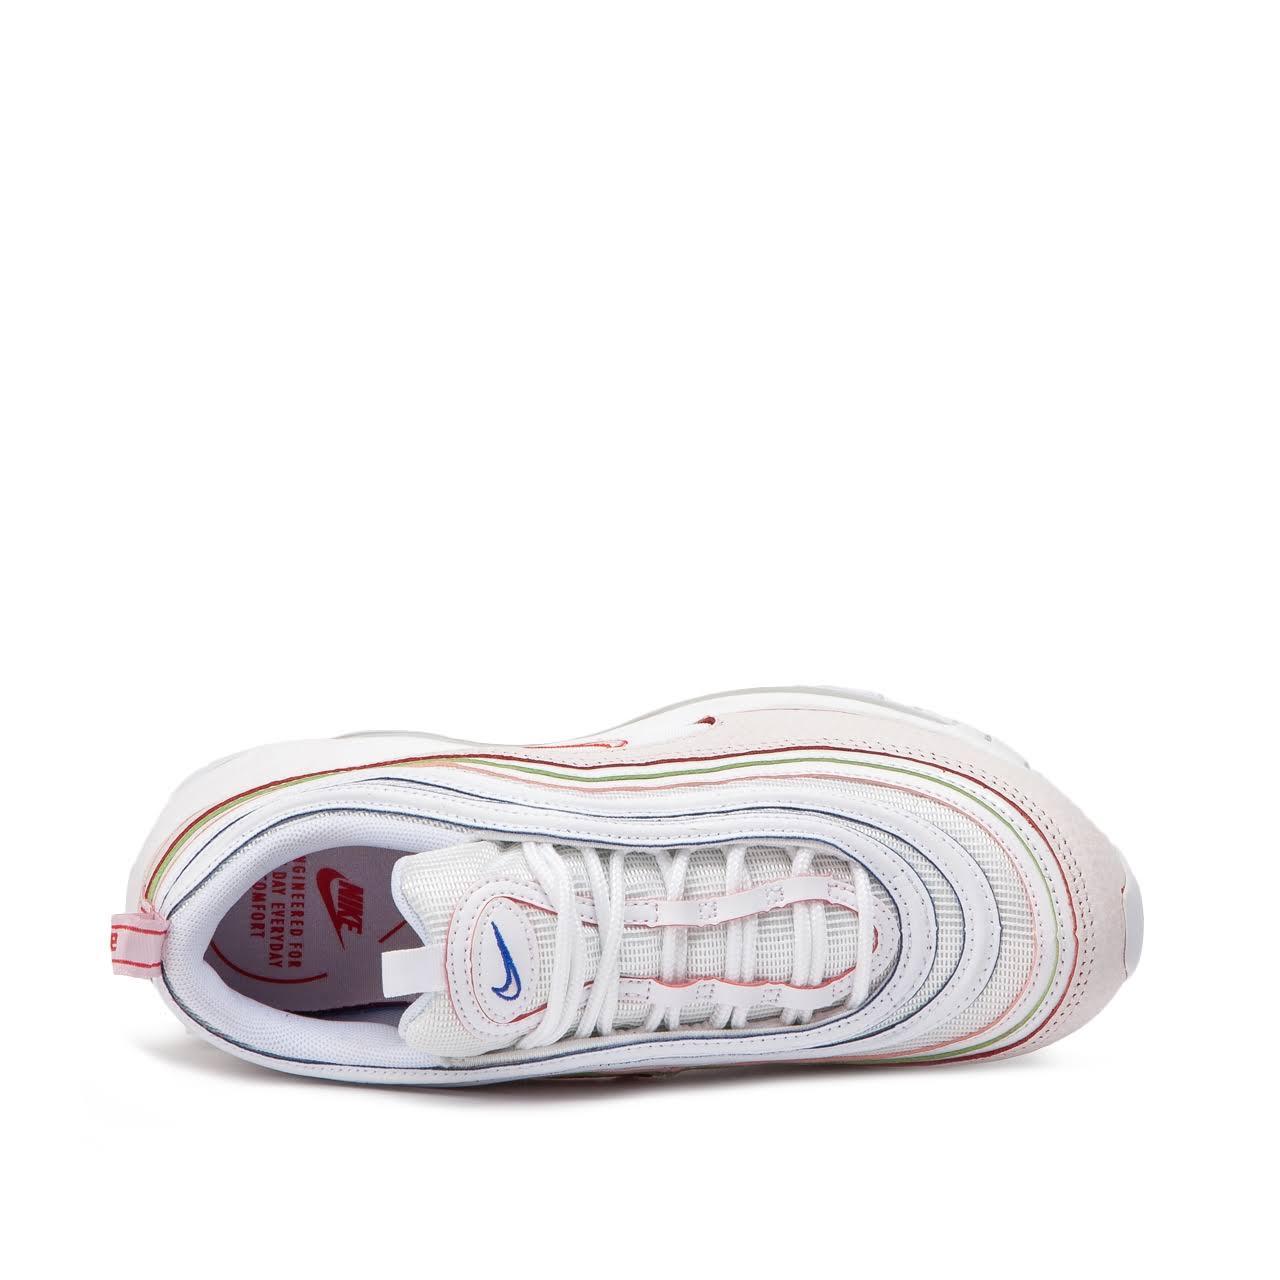 'rainbow' Deporte Nike 97 Mujer 8 Max 5 Wmns Zapatillas Talla Air De Para 5XaIIw